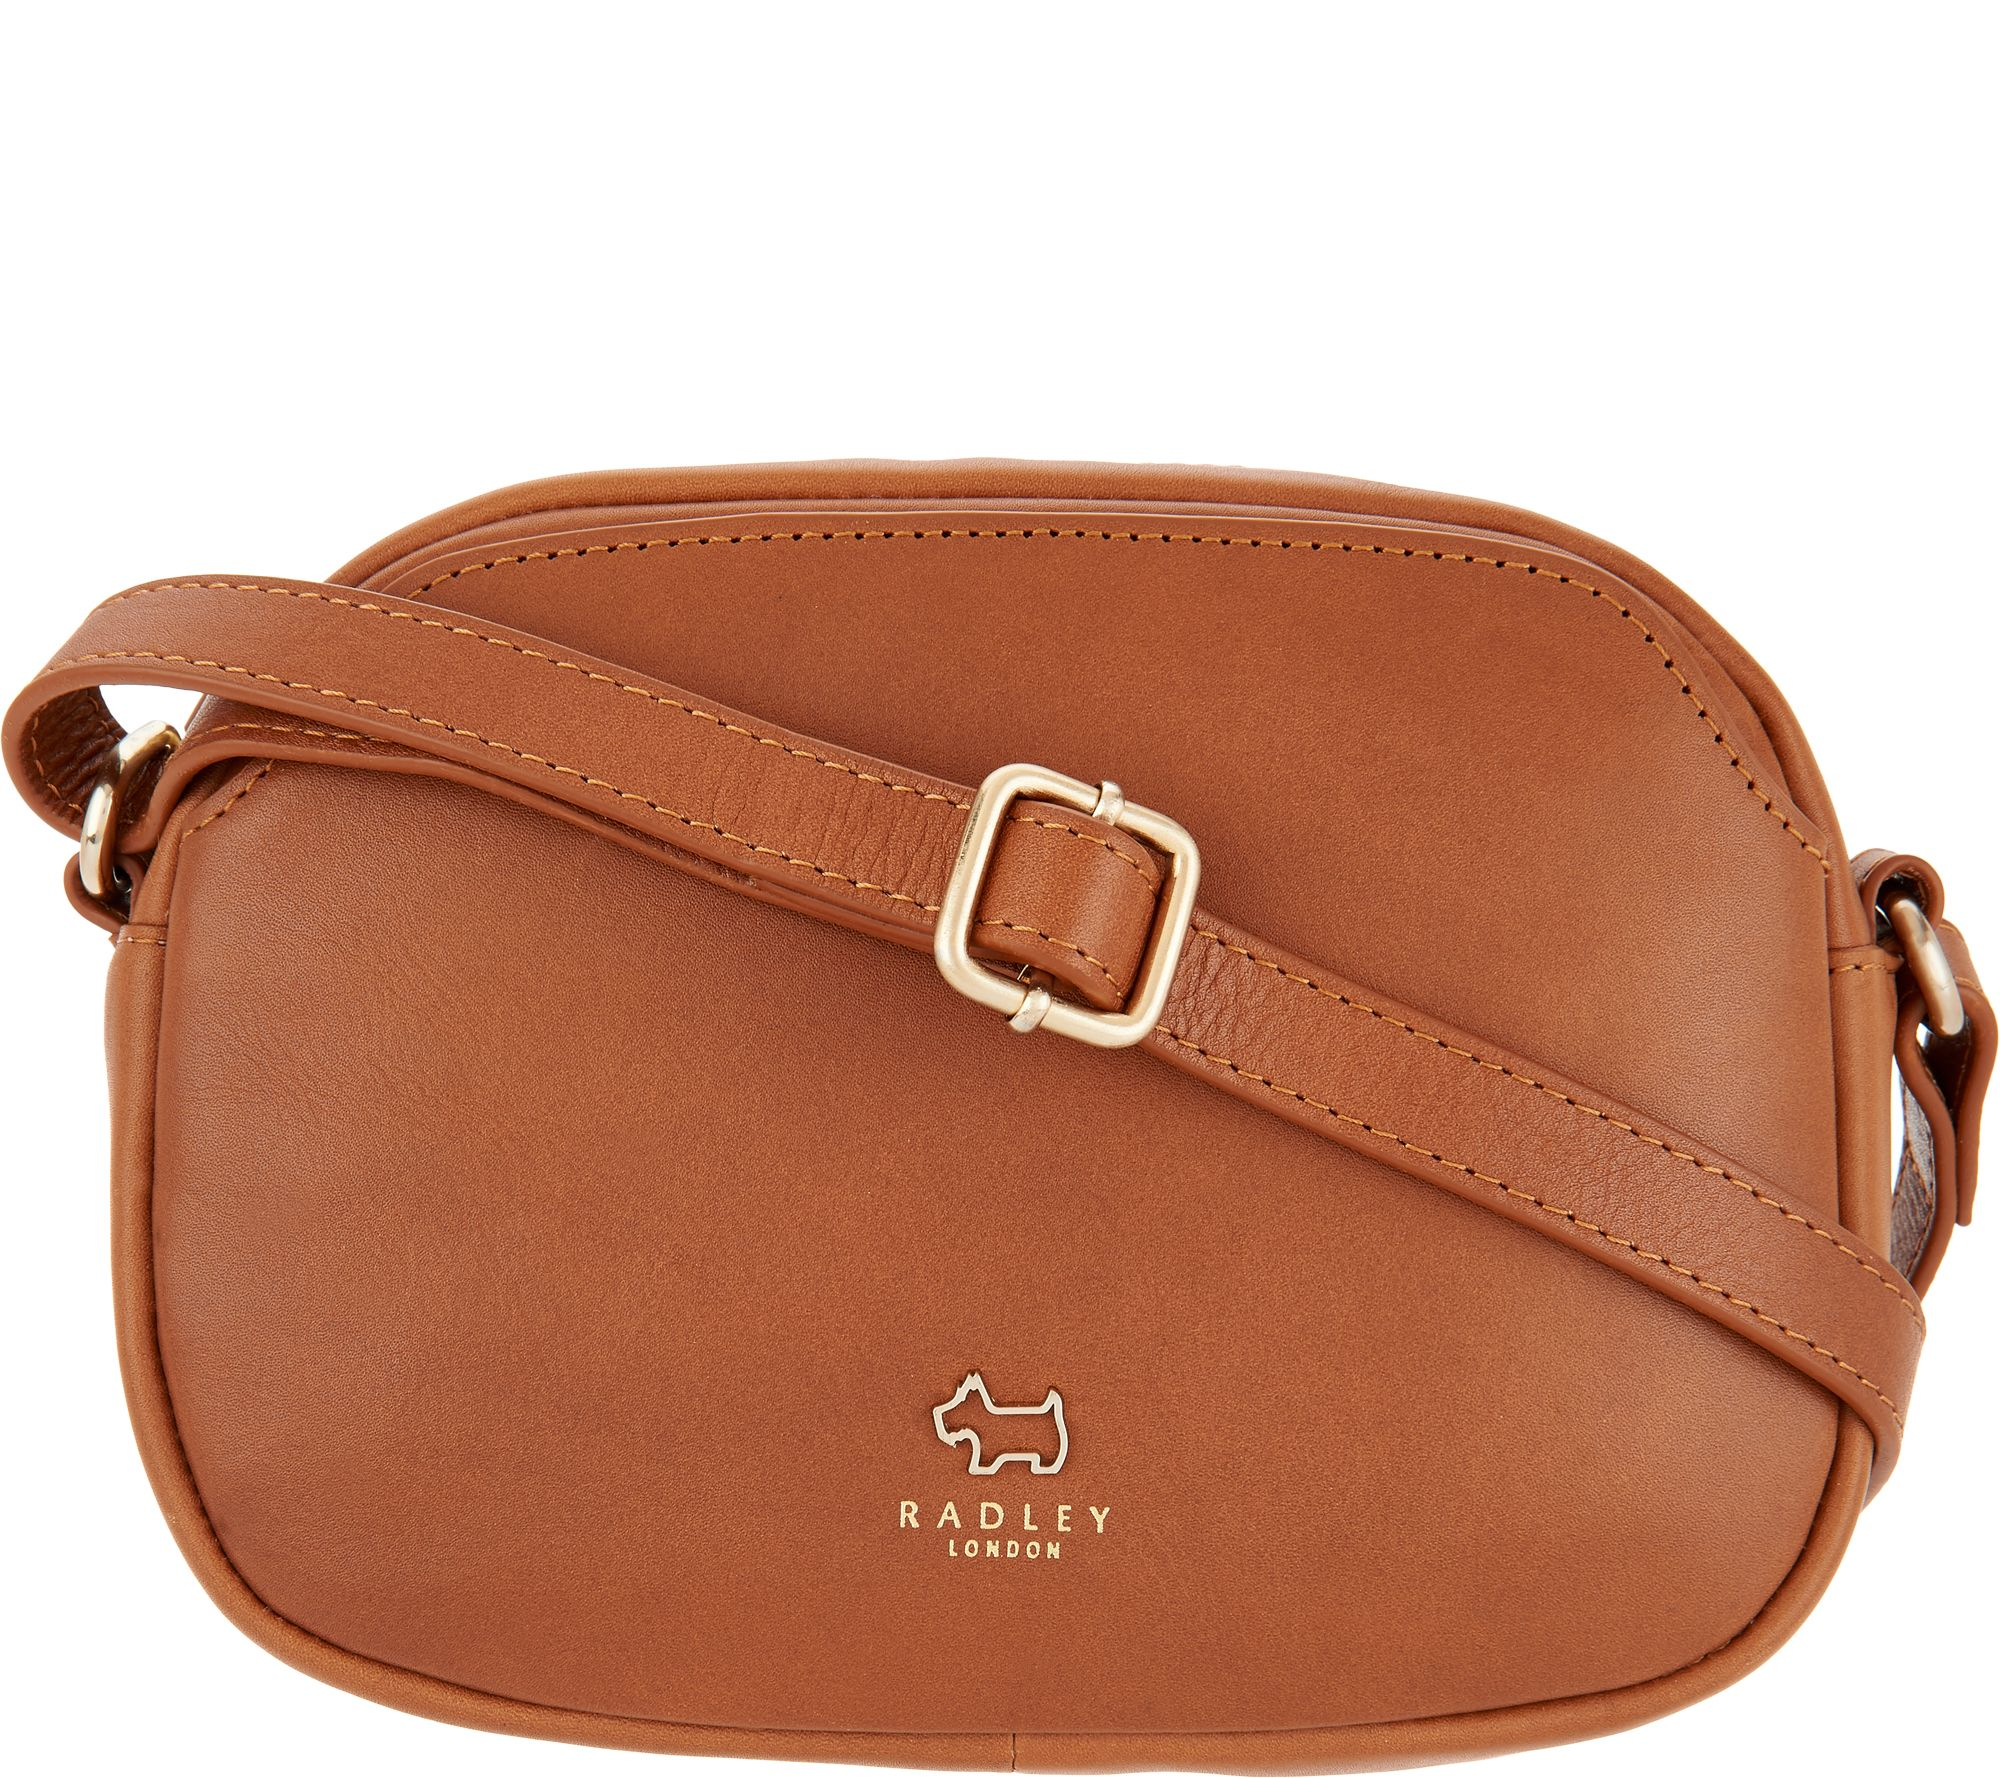 special price for huge selection of classic style RADLEY London Greyfriar's Garden Crossbody Handbag — QVC.com